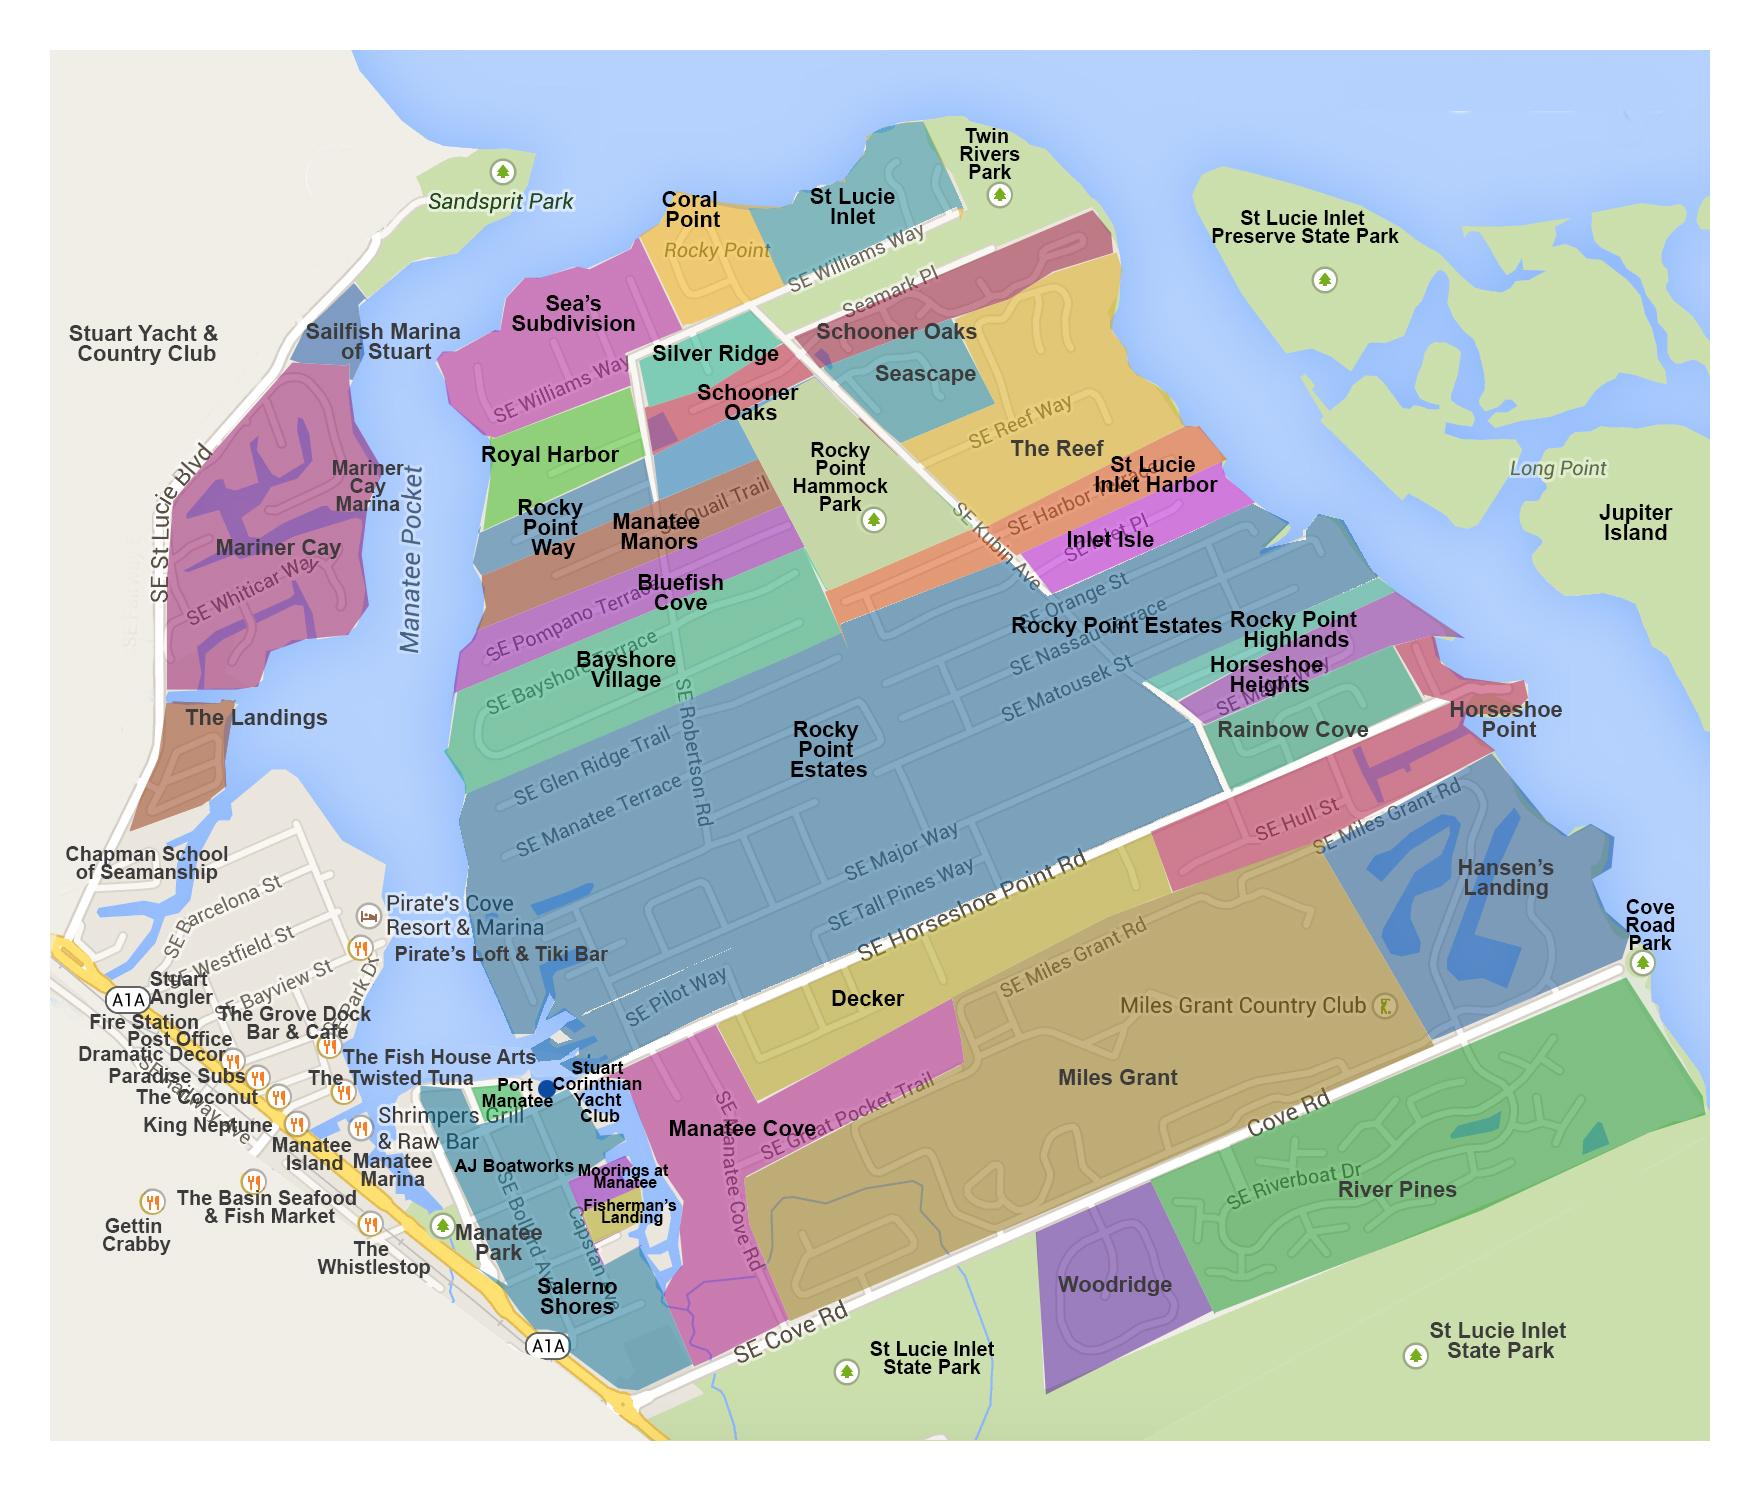 PortSalernoFL.com Map